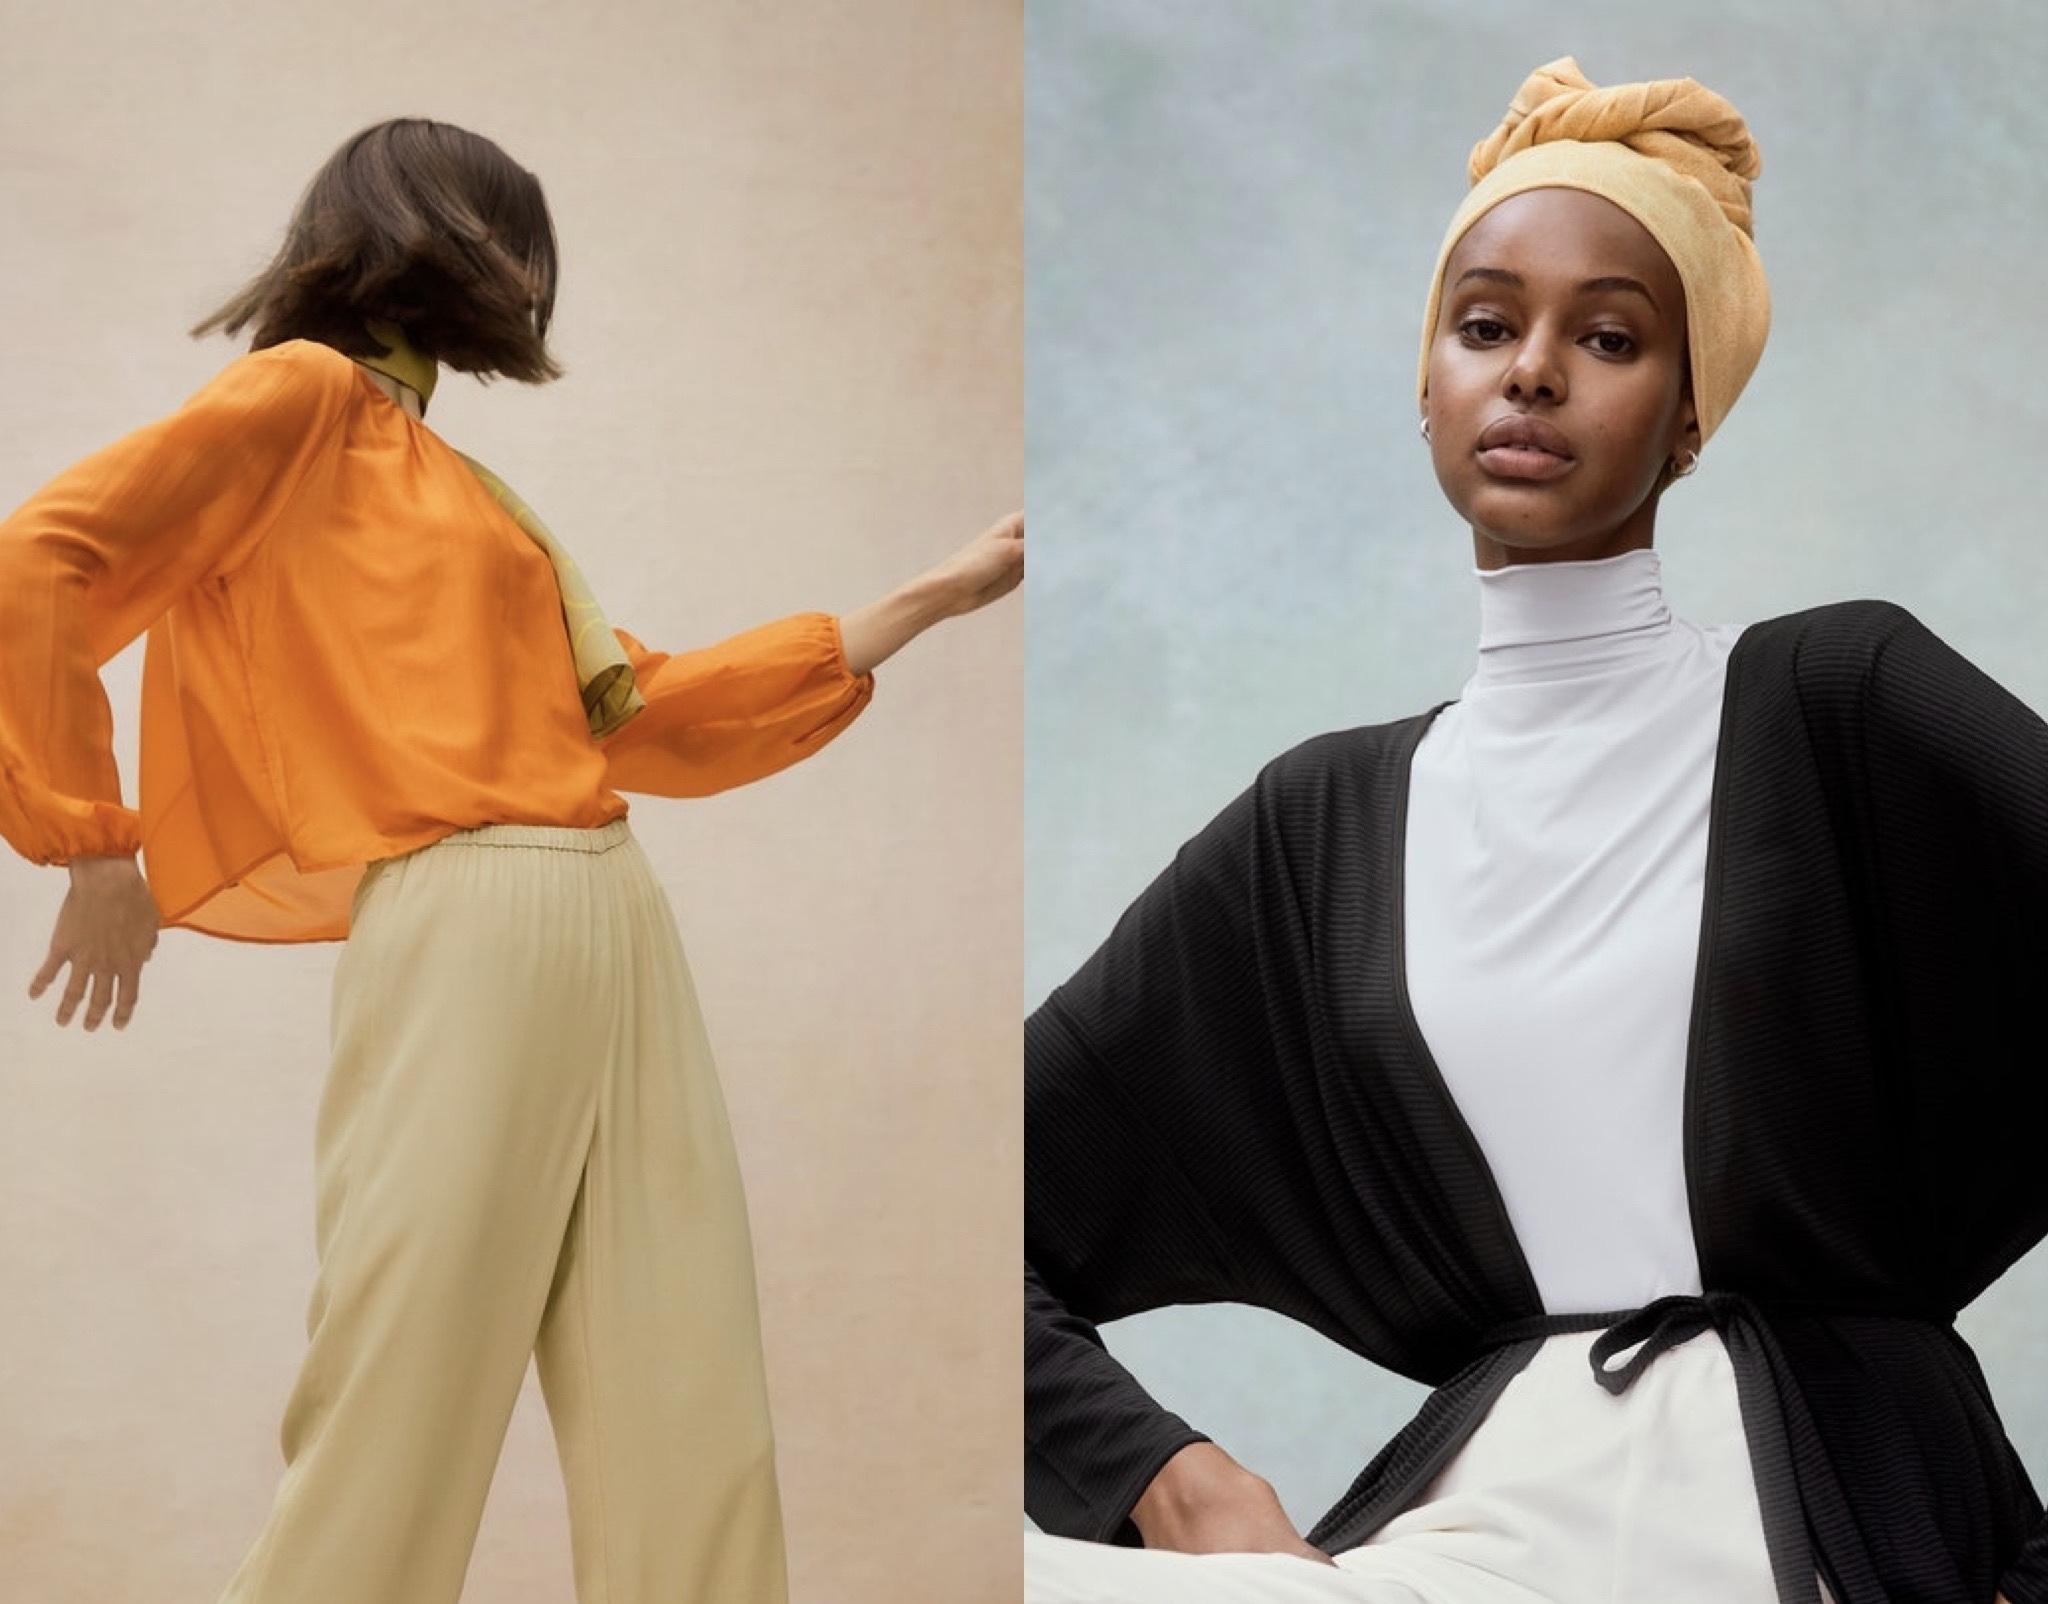 Hana Tajima's culturally inclusive Uniqlo line adapts to body changes